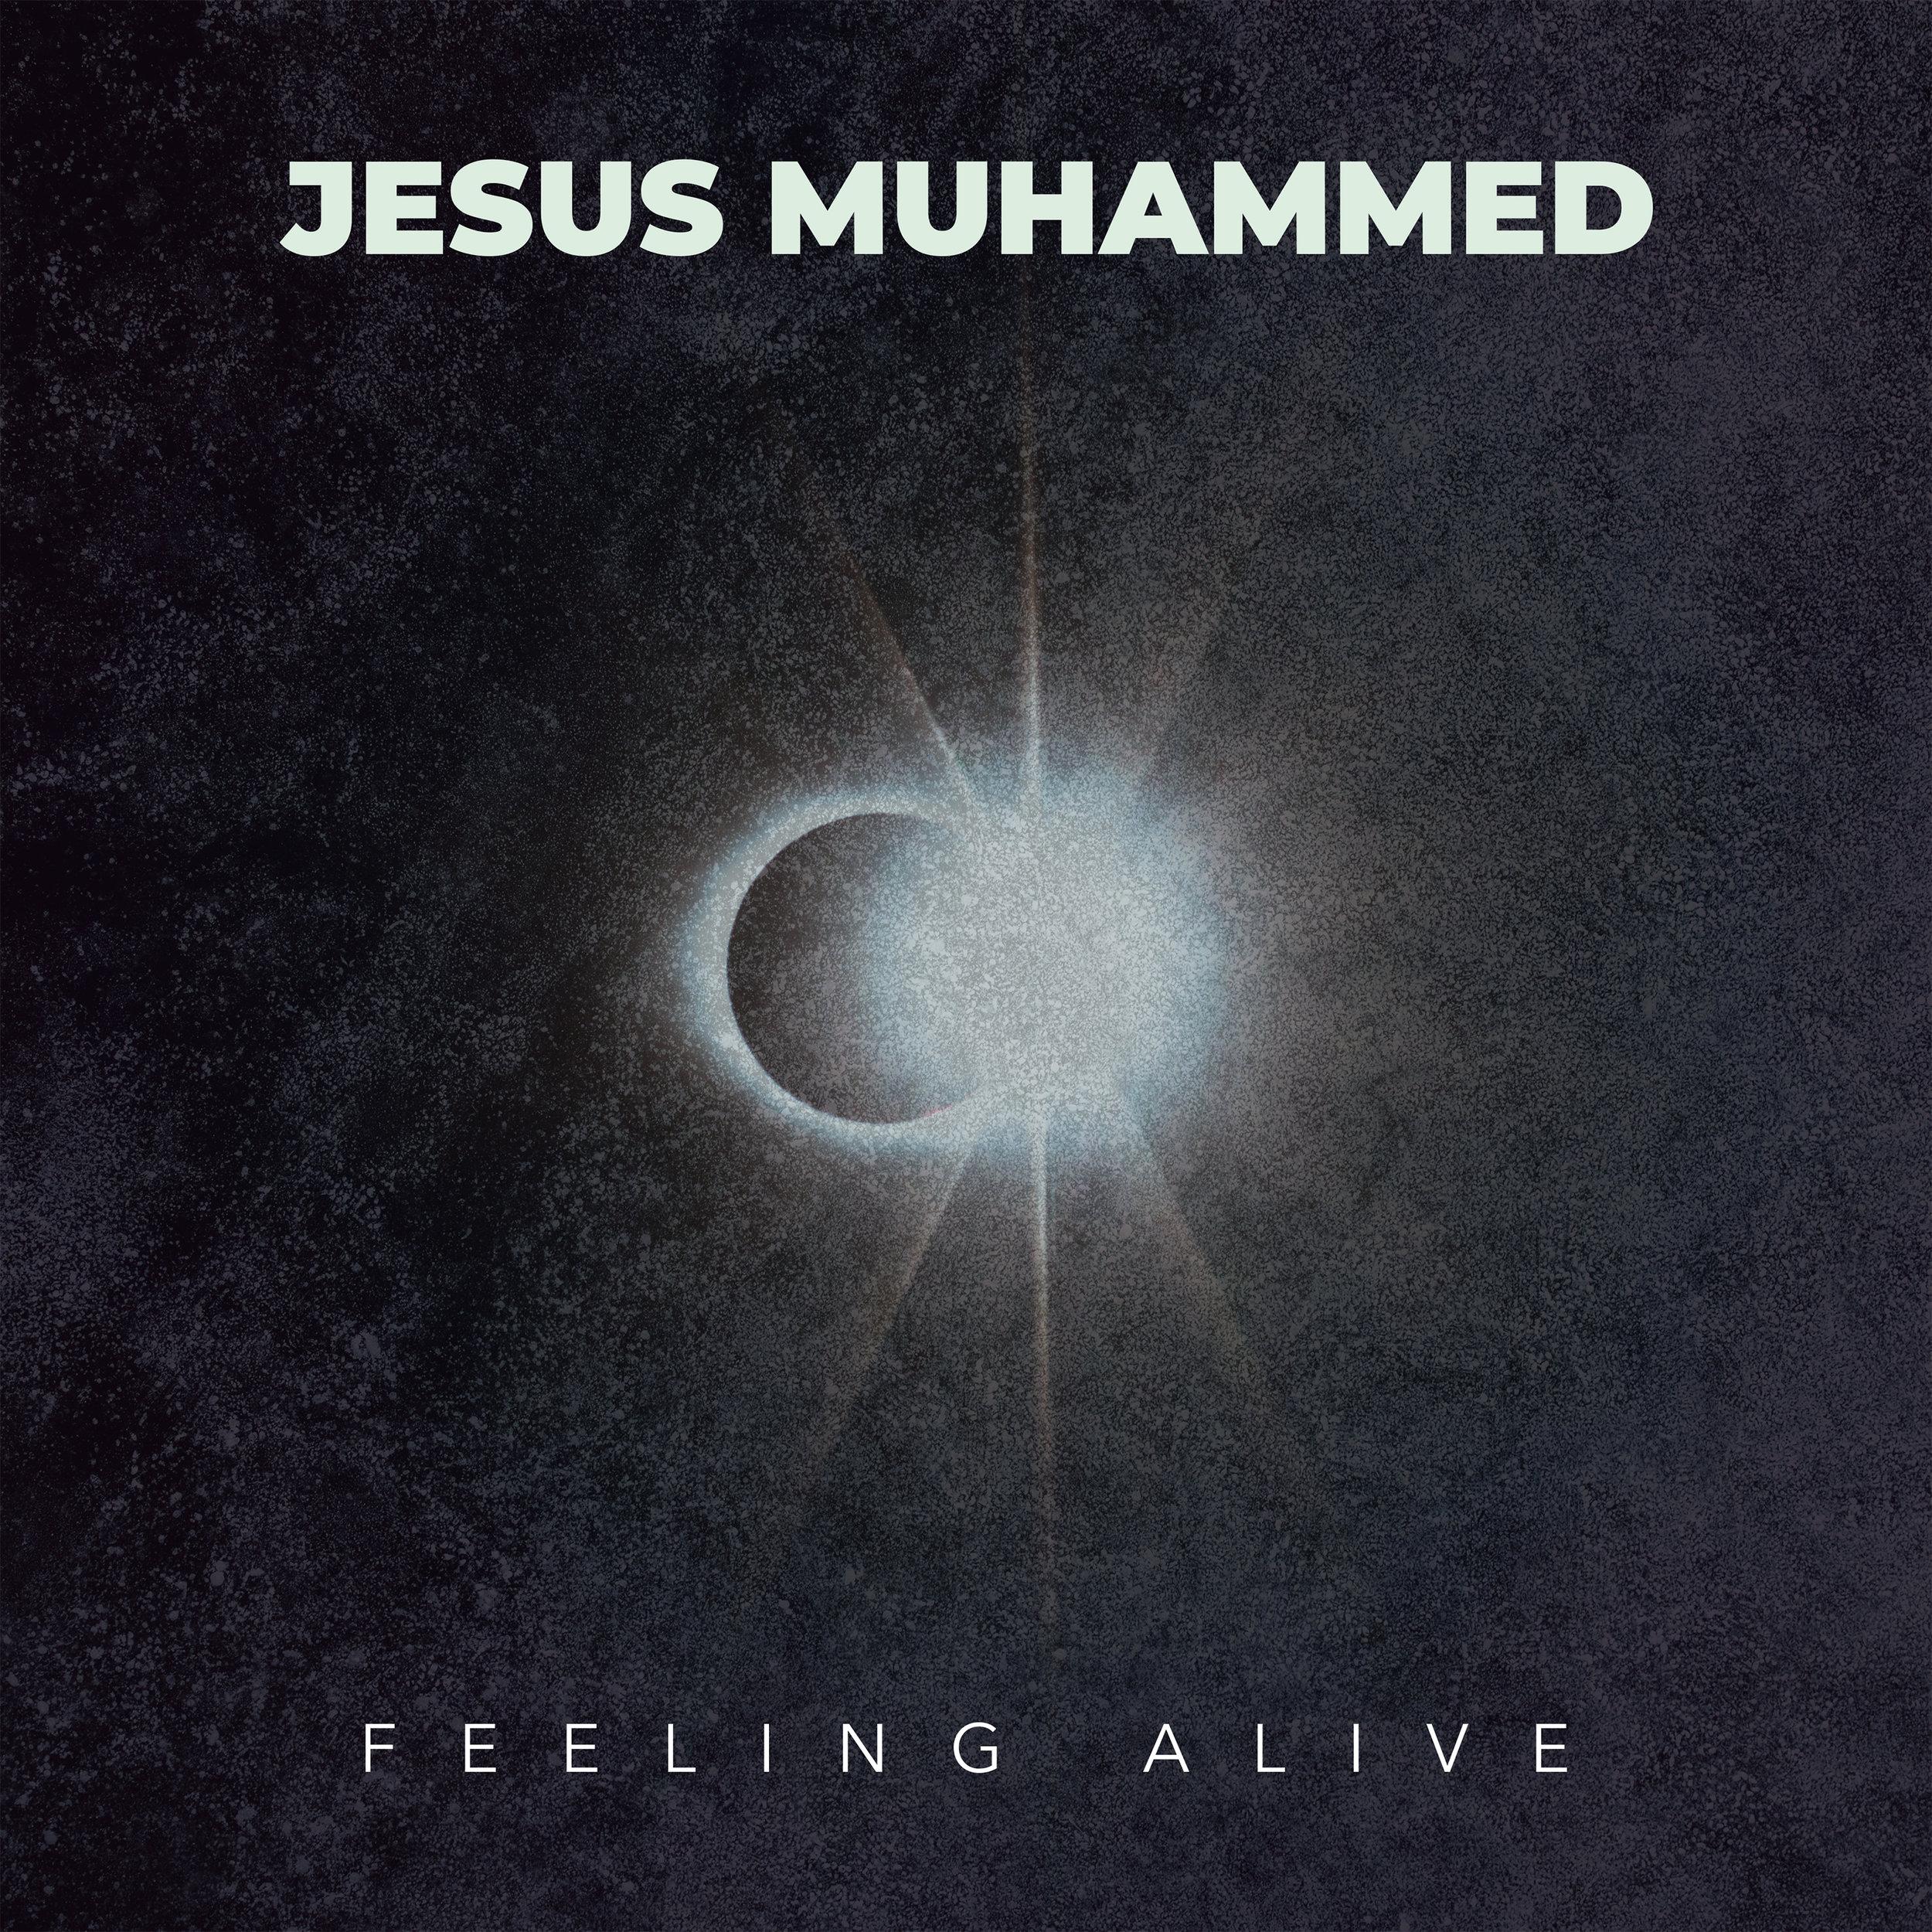 Jesus Muhammed - feeling-alive-by-jesus-muhammed-1561929512.jpg